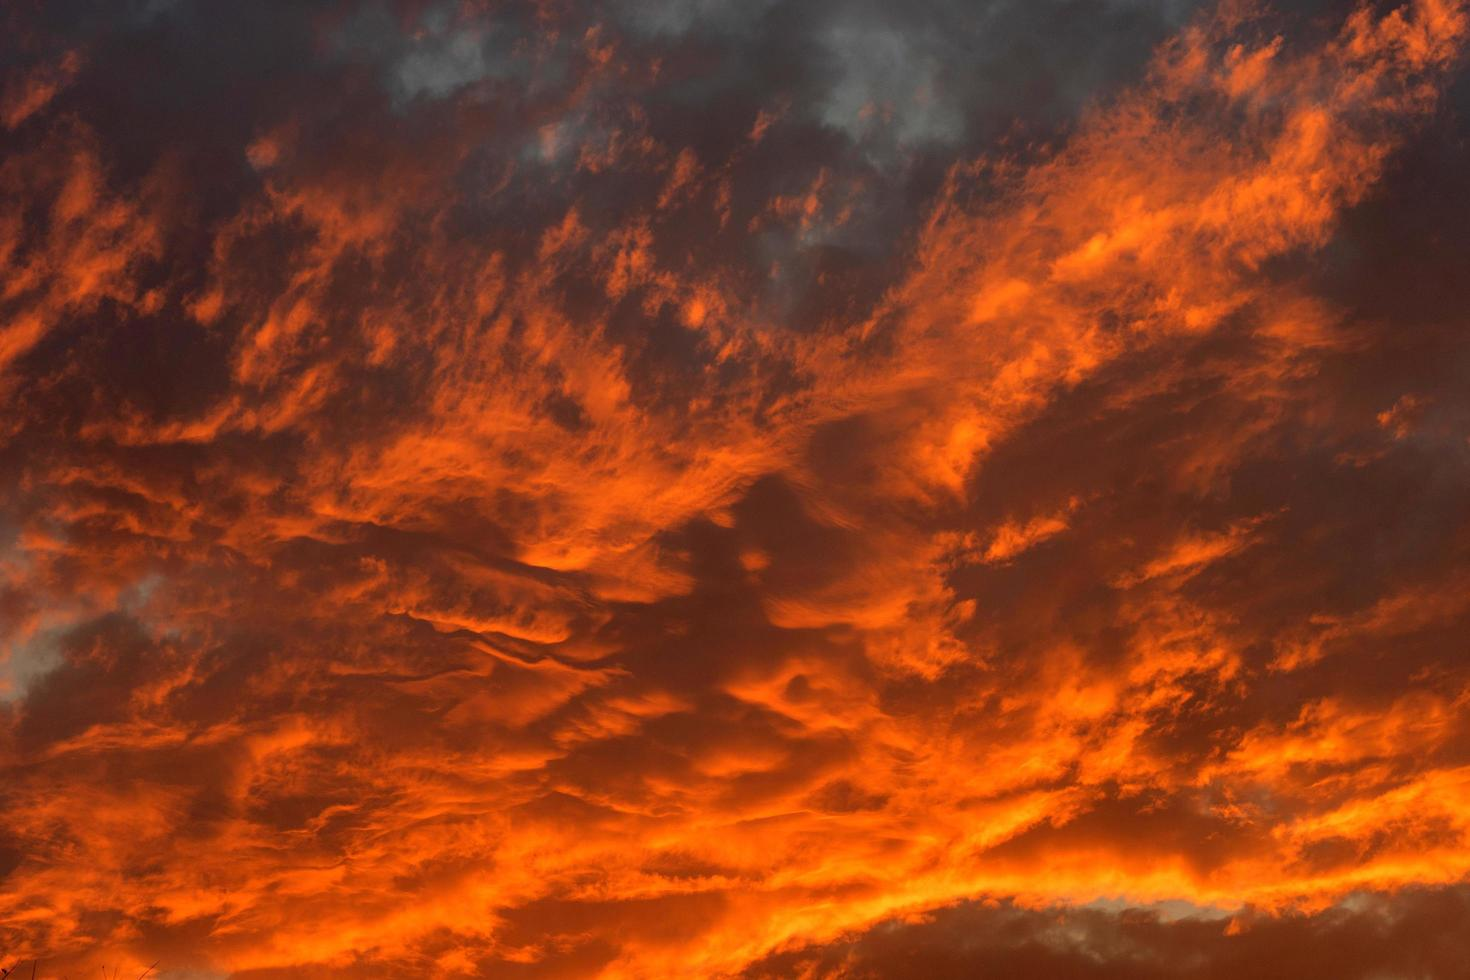 oranje en rode zonsondergang foto